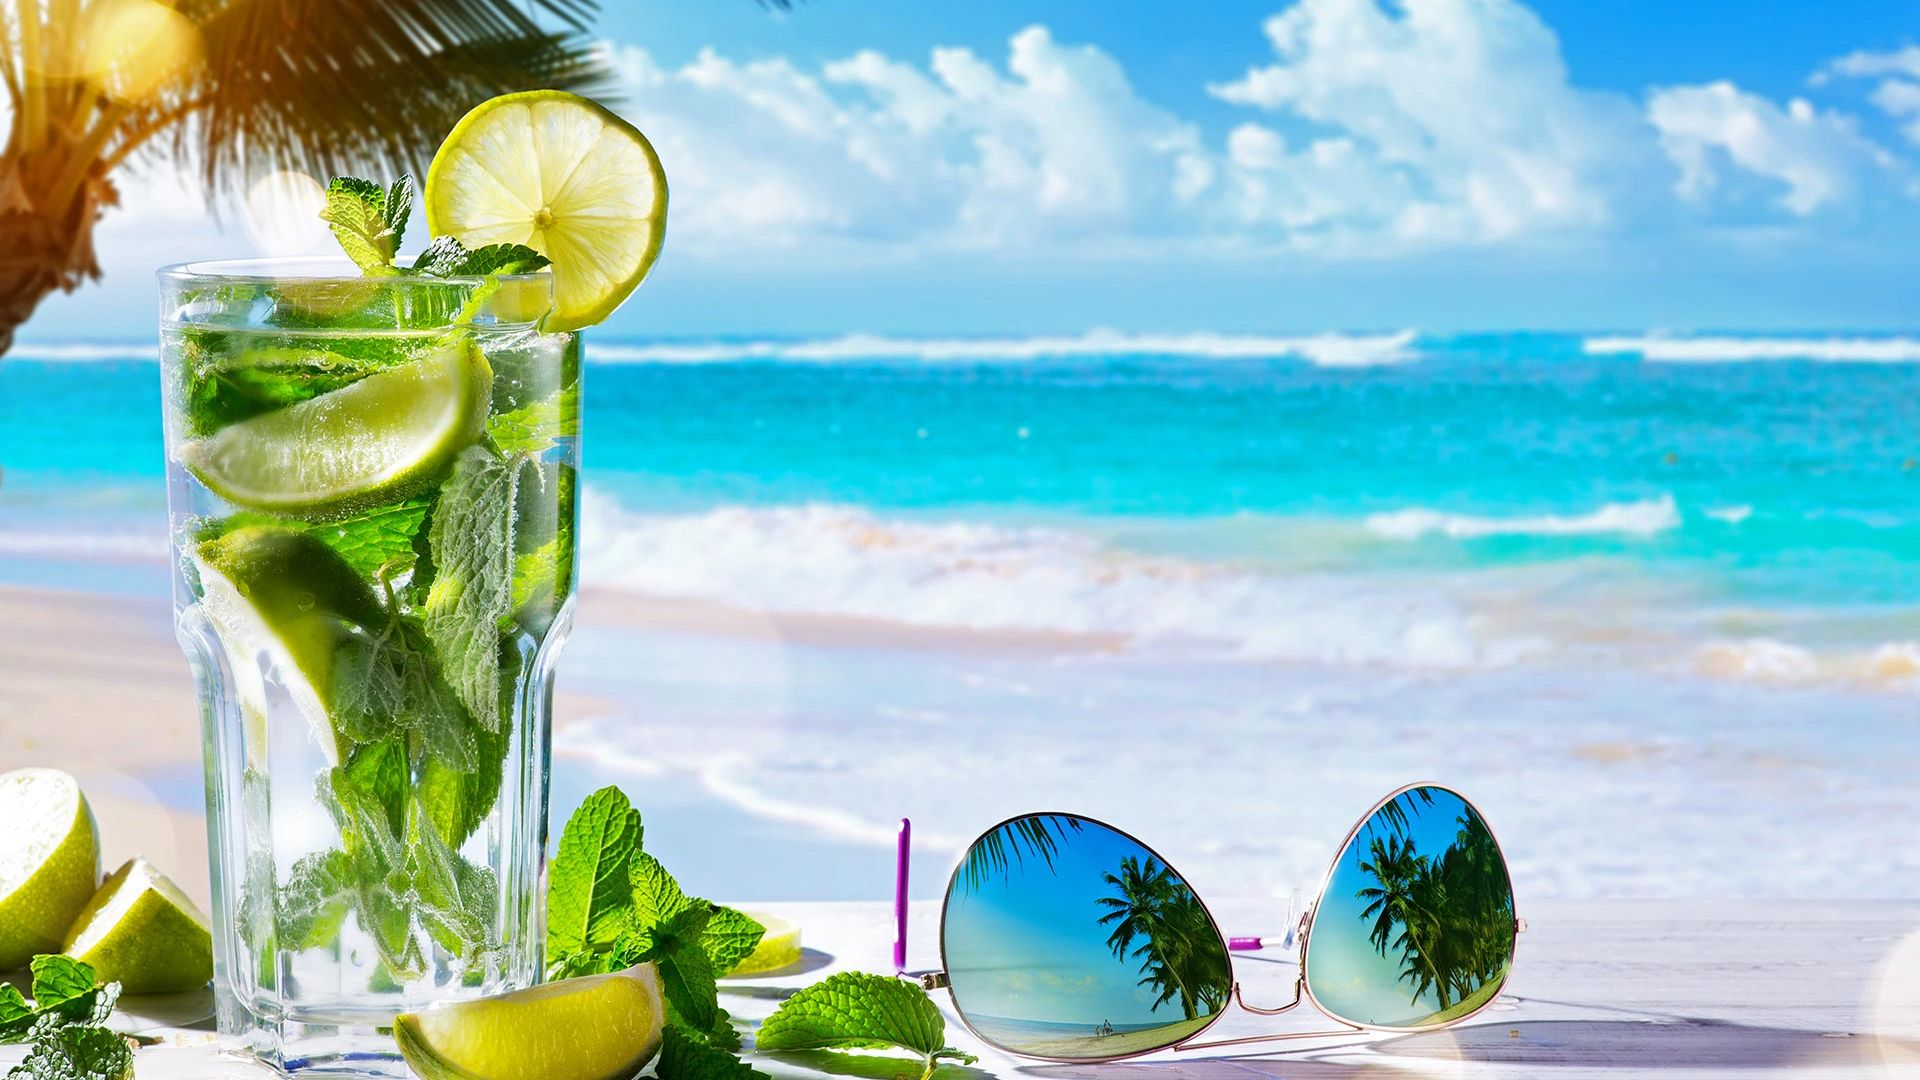 Sejur plaja Cancun si Riviera Maya, Mexic, 11 zile - ianuarie 2022